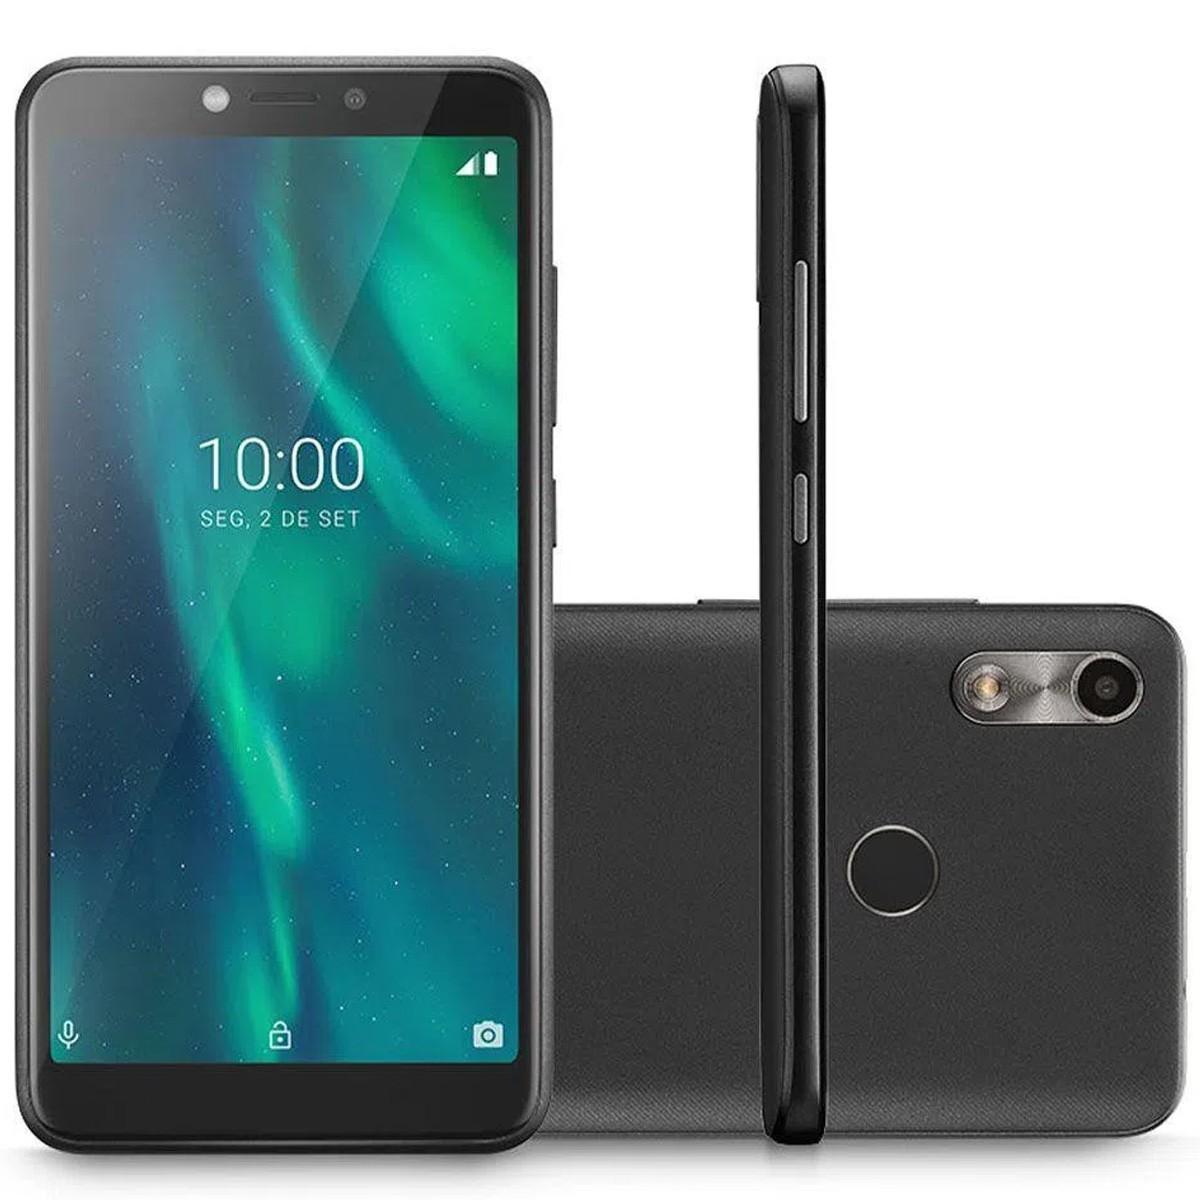 Smartphone Multilaser F P9130 32gb 3g Tela 5.5 Dual 5mp